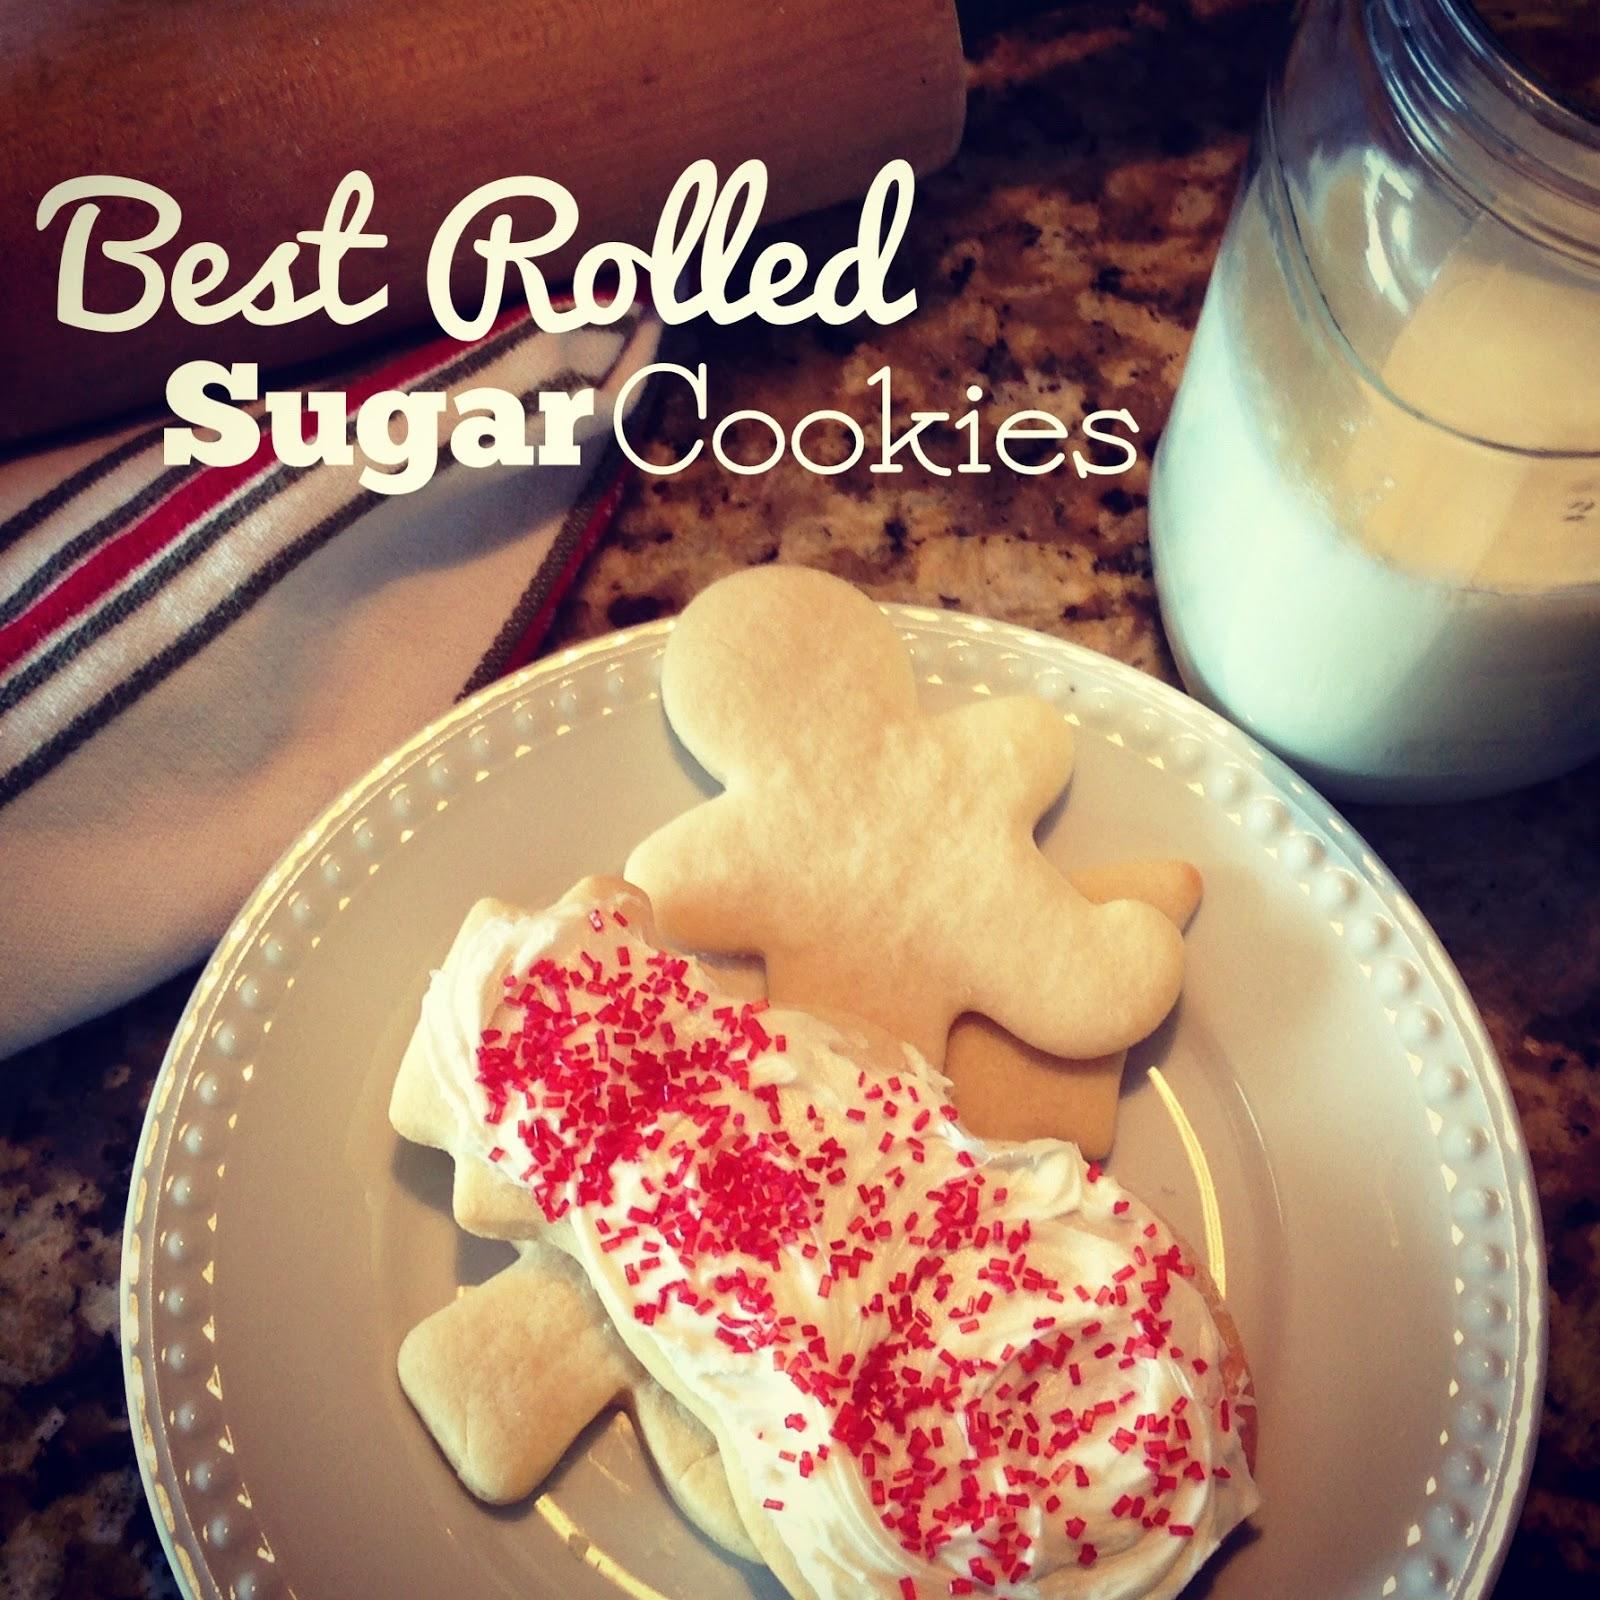 Guilt free oatmeal cookies recipe